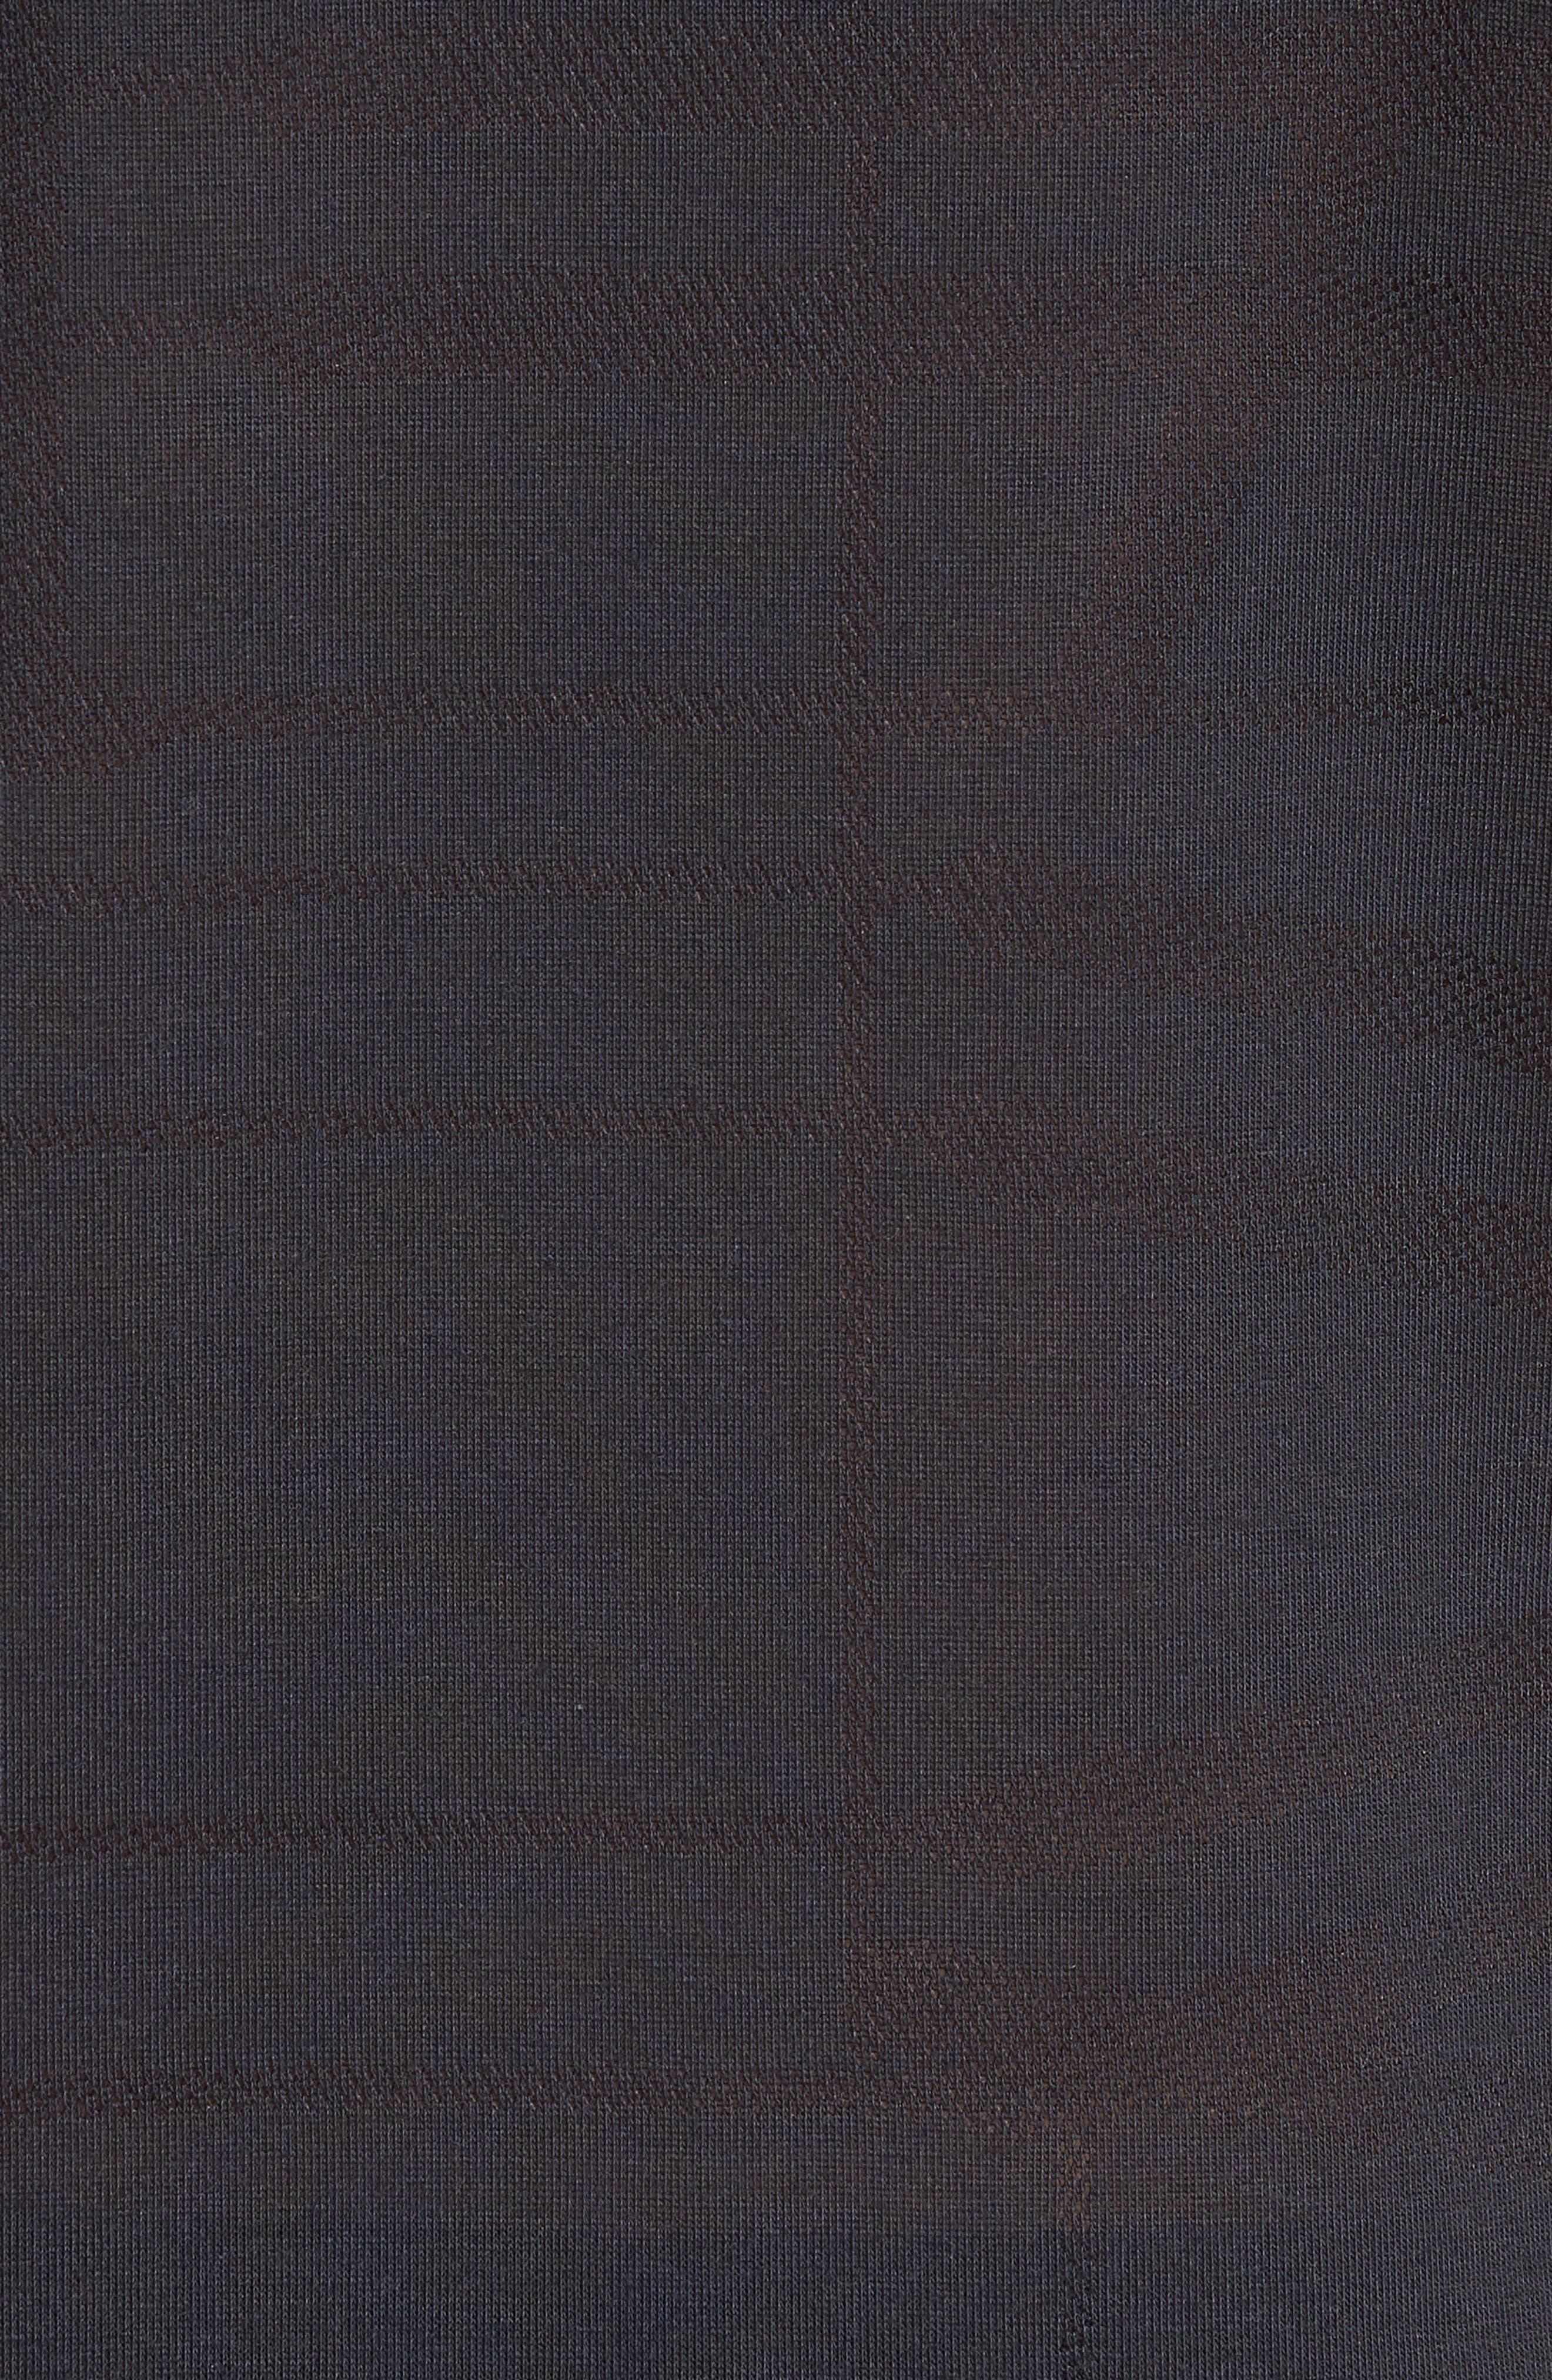 Threadborne Elite Crewneck T-Shirt,                             Alternate thumbnail 5, color,                             Black/ Graphite